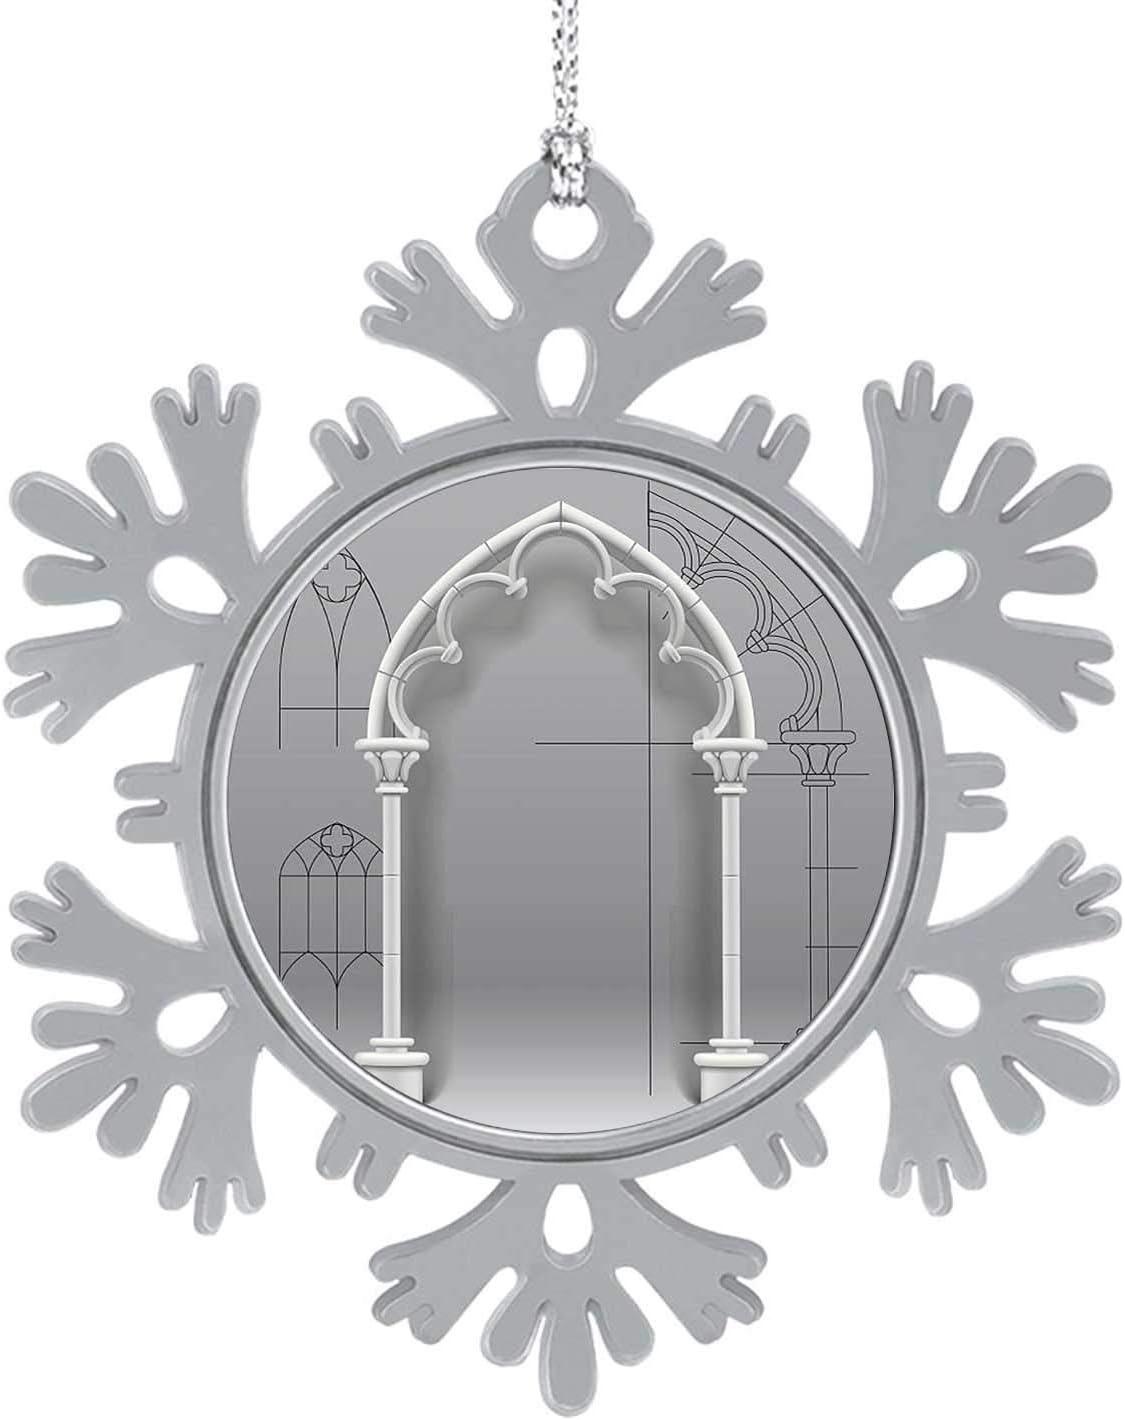 C COABALLA Gothic Arch - - Arch - Architectural Feature,Cute 2020 Home Décor Hanging Snowflake Decorations Ornament Gothic Style 1PCS